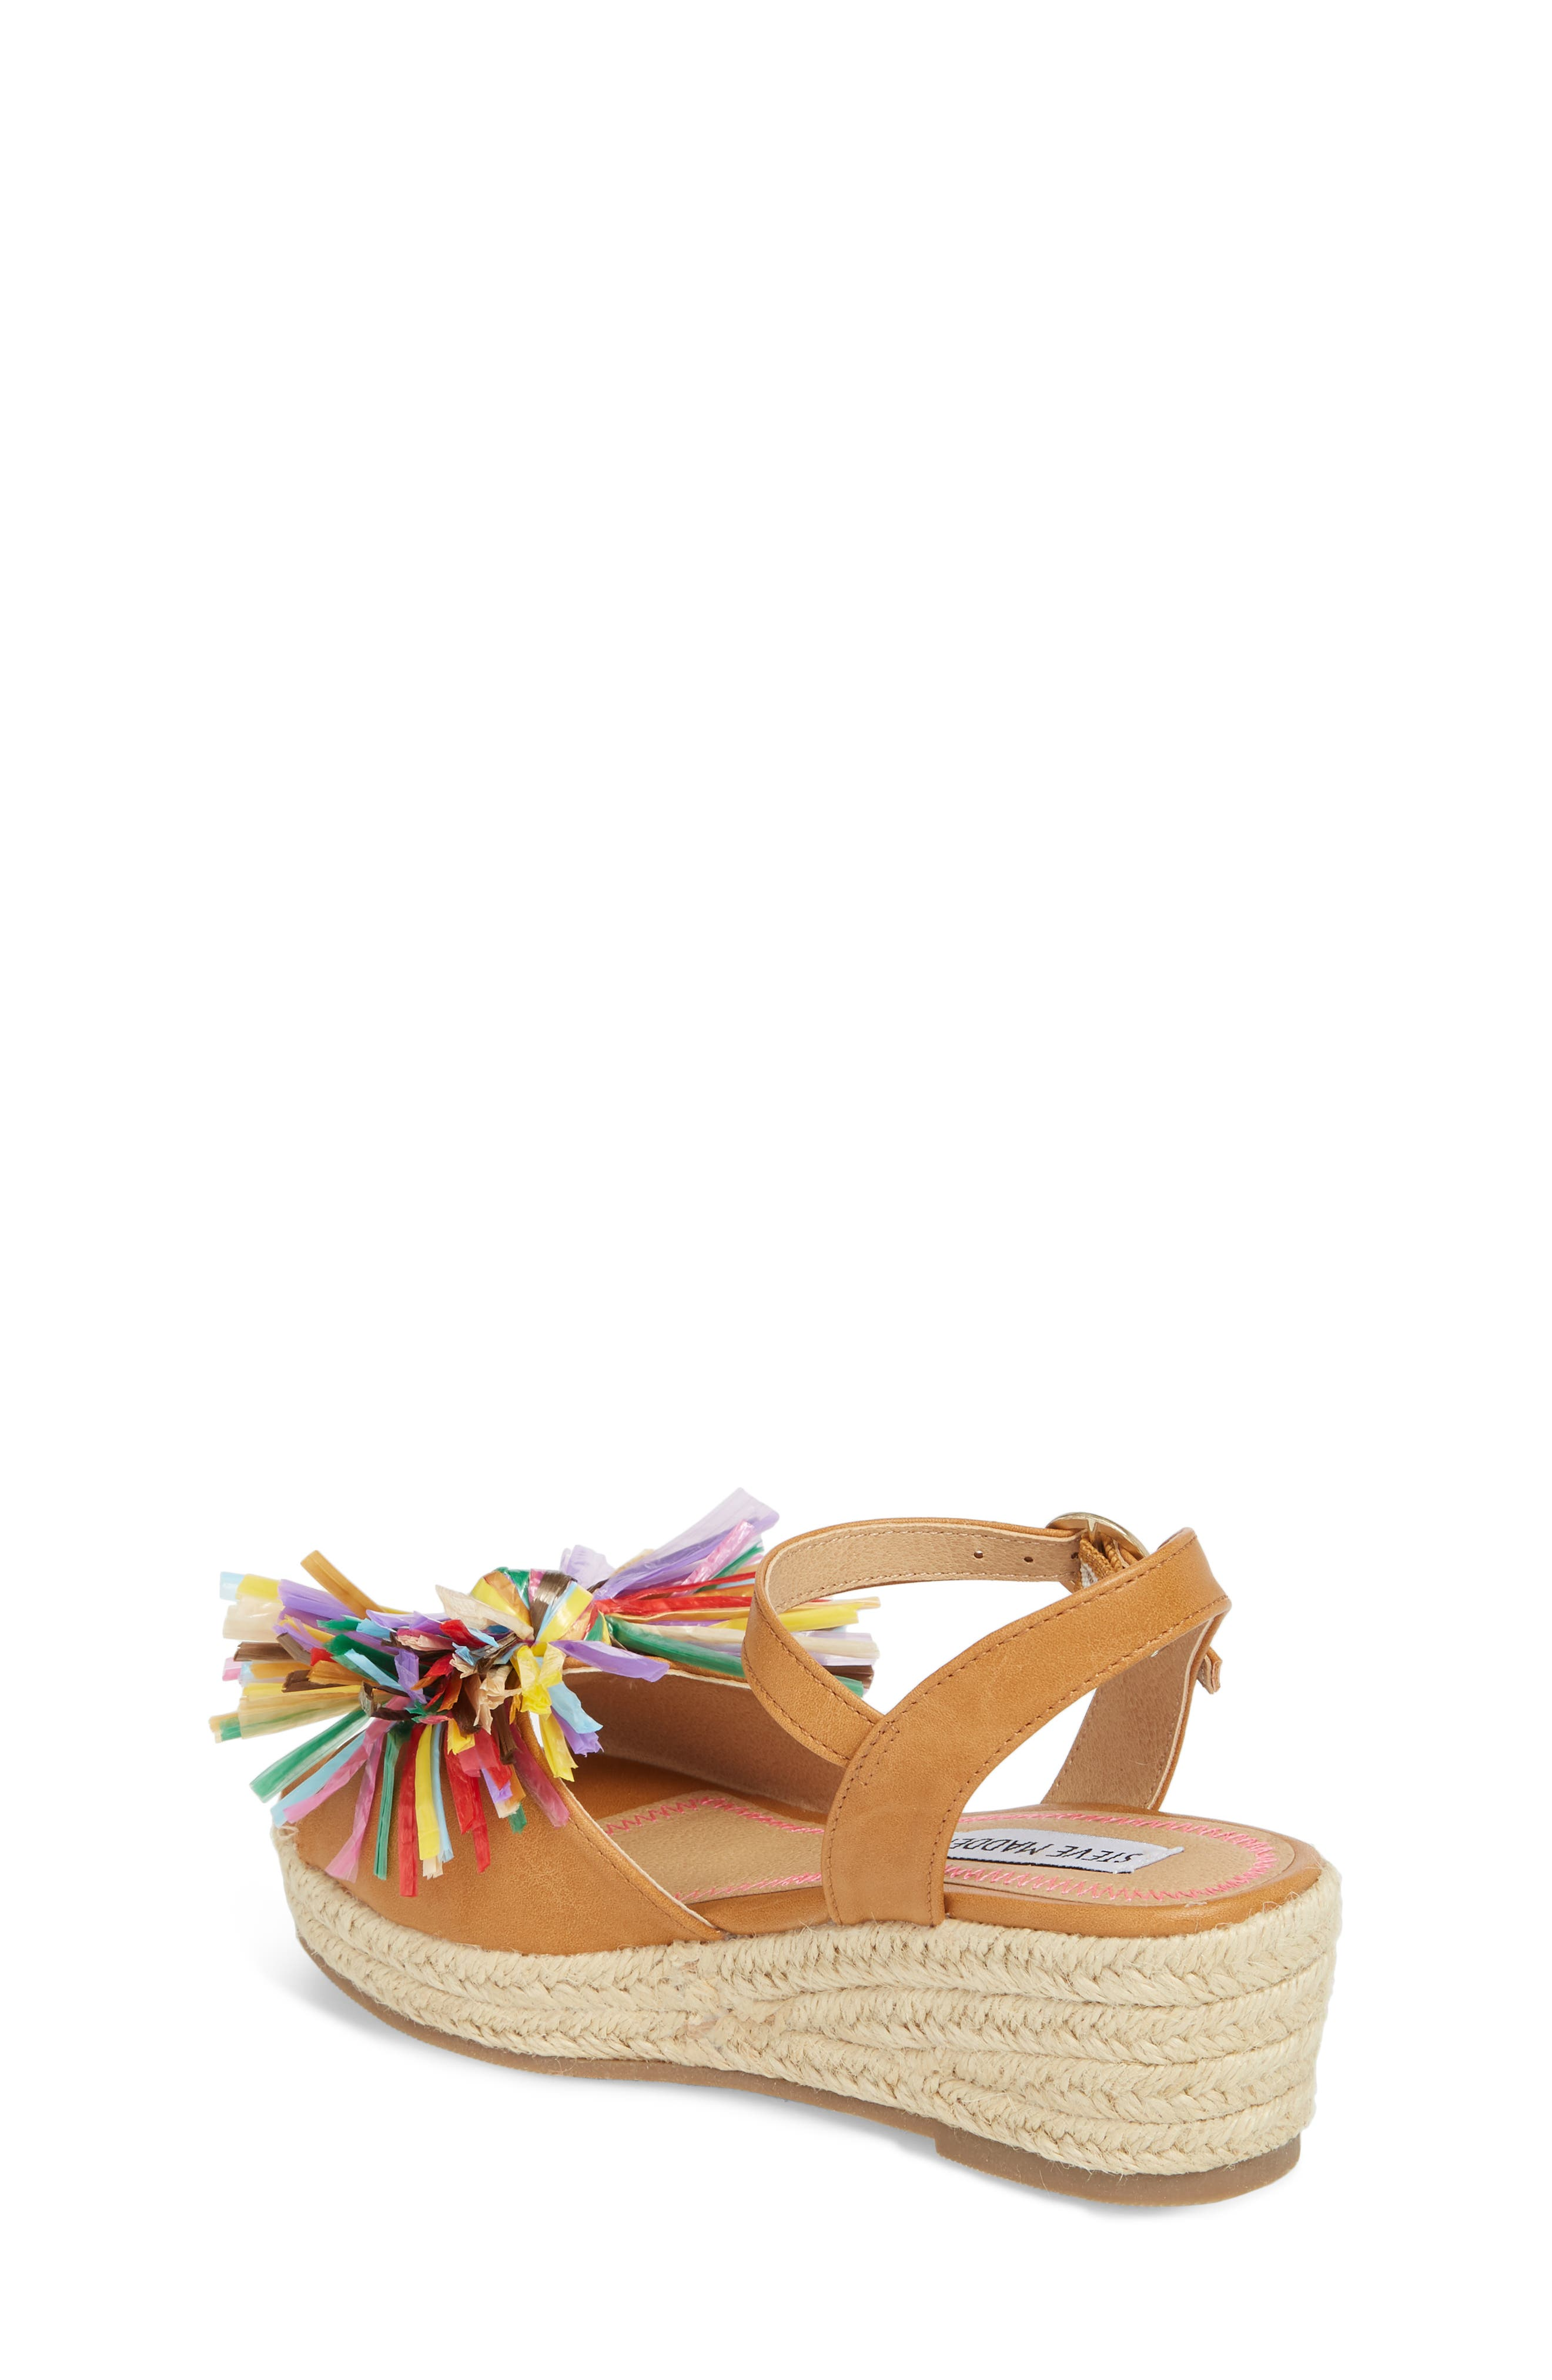 JSTRWBERI Wedge Sandal,                             Alternate thumbnail 2, color,                             Cognac Multi